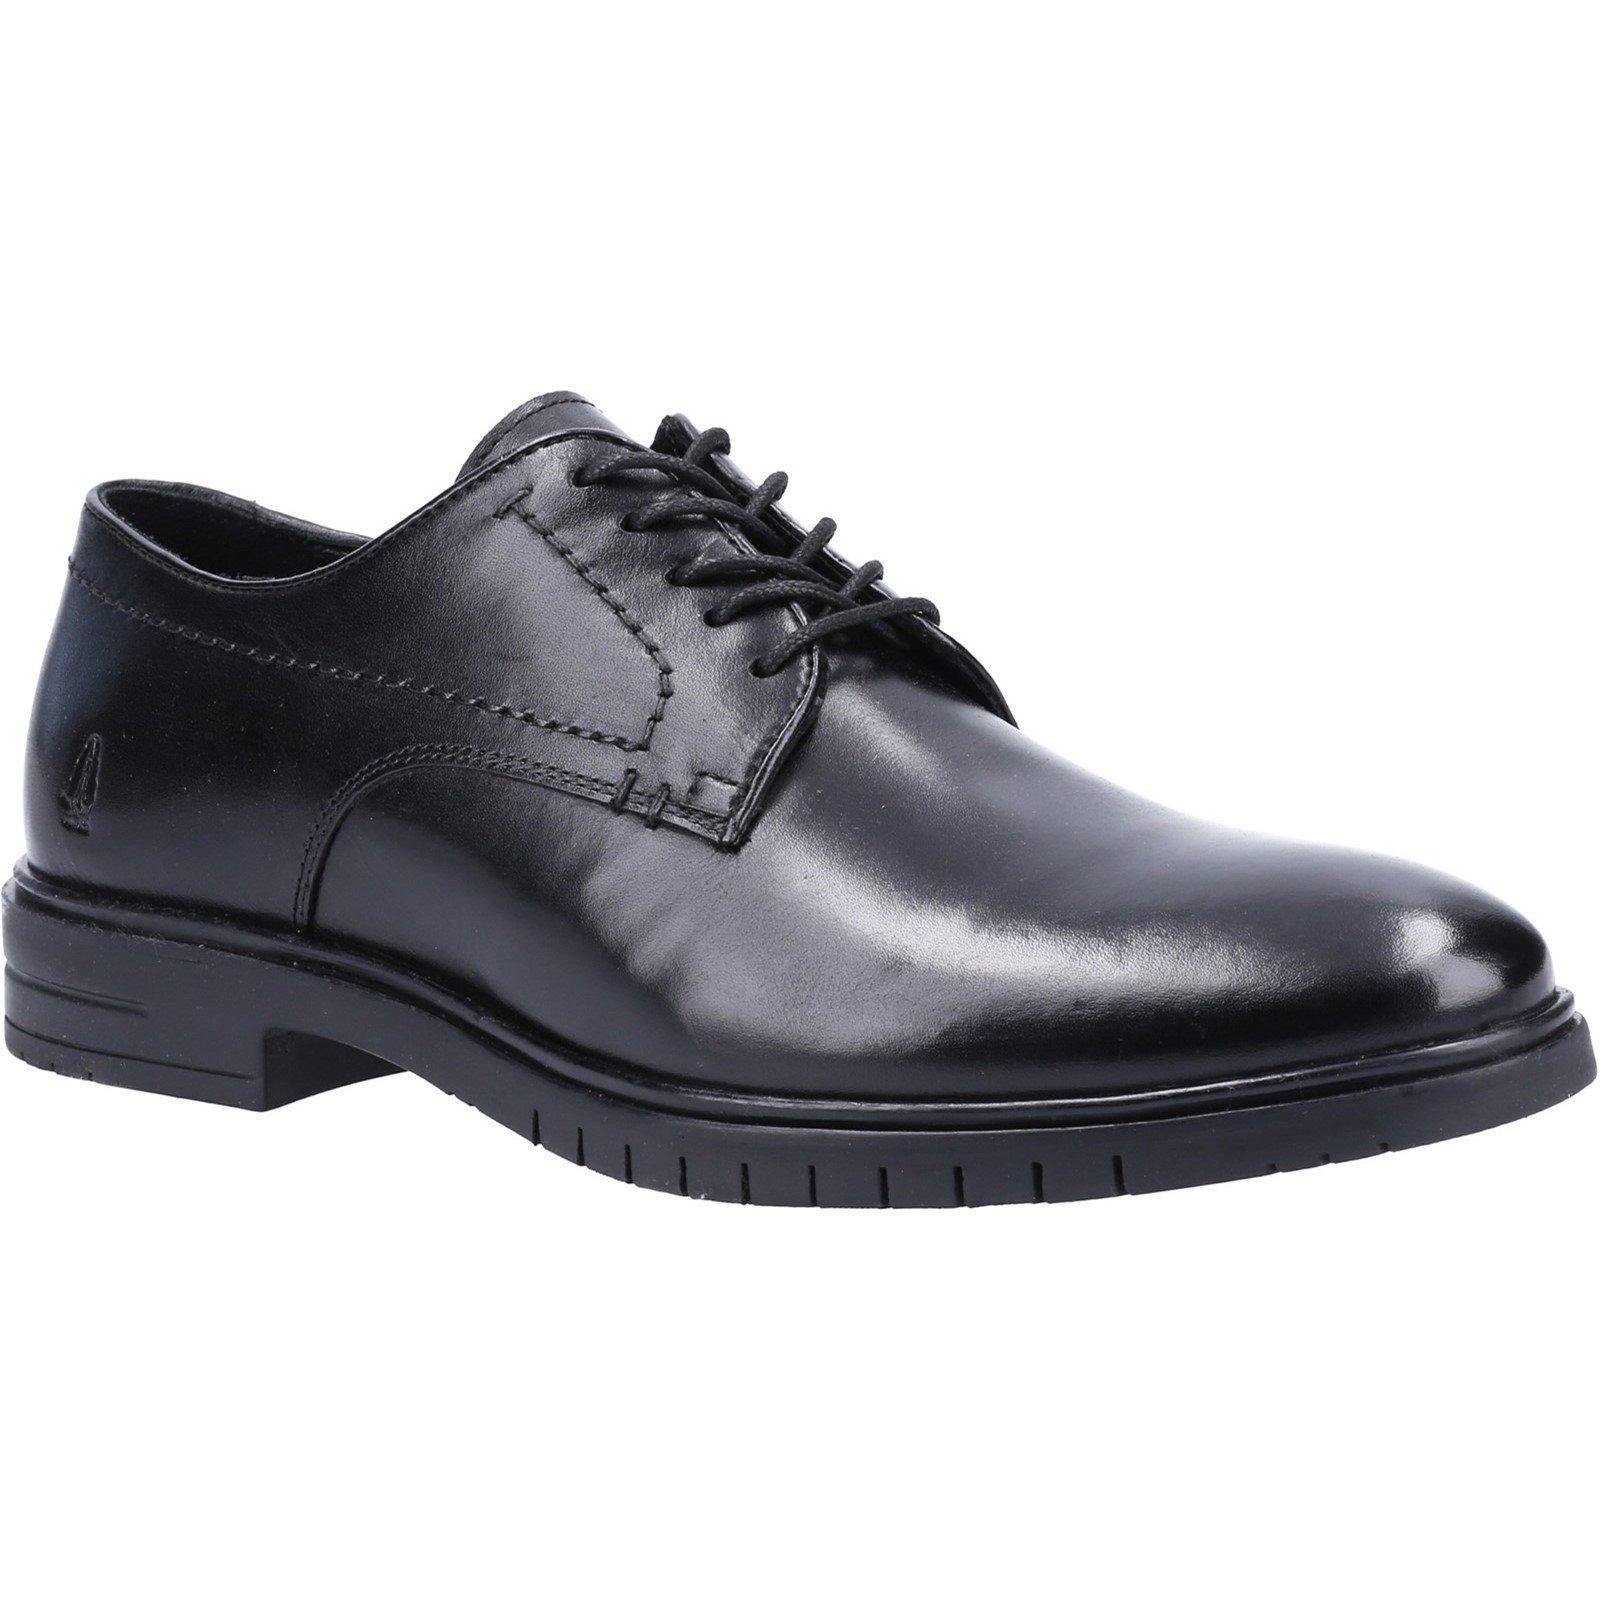 Hush Puppies Men's Sterling Lace Derby Shoe Black 31992 - Black 7